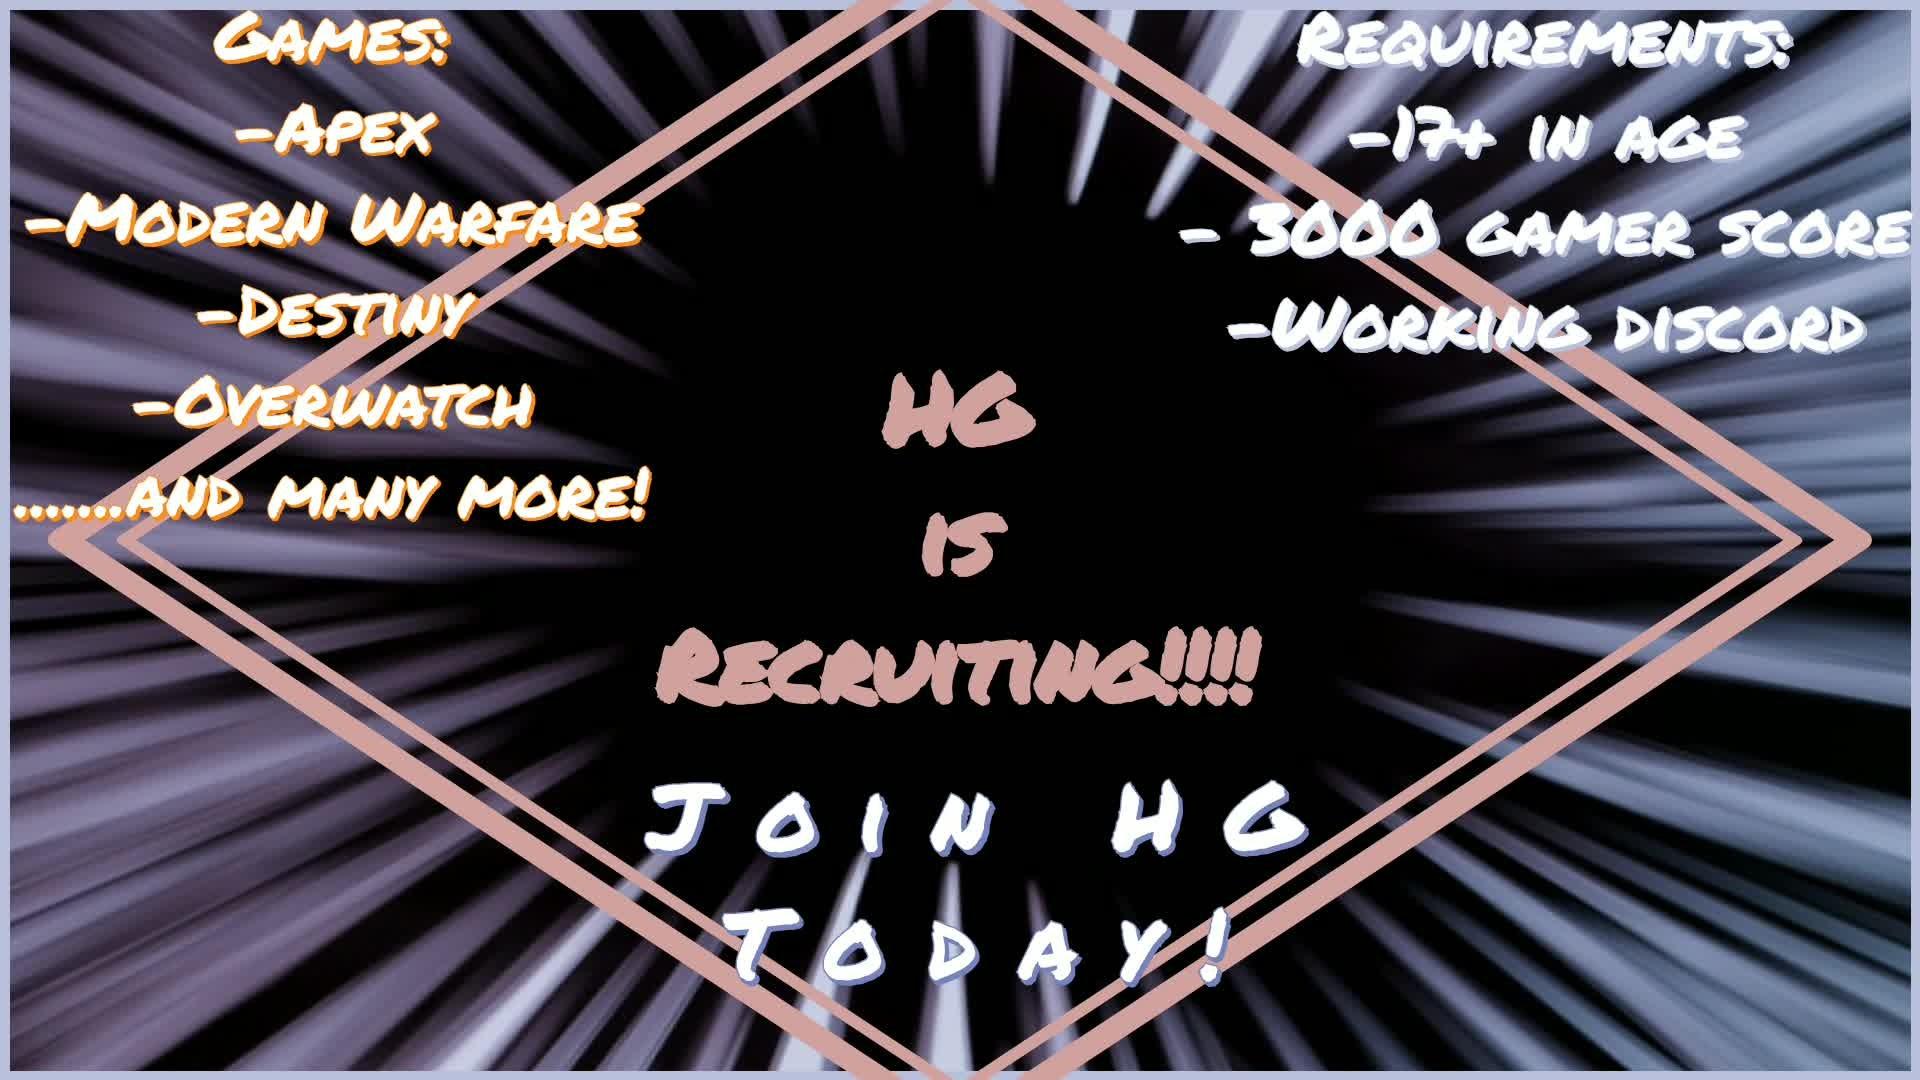 Destiny: Promotions - Recruitment! video cover image 1